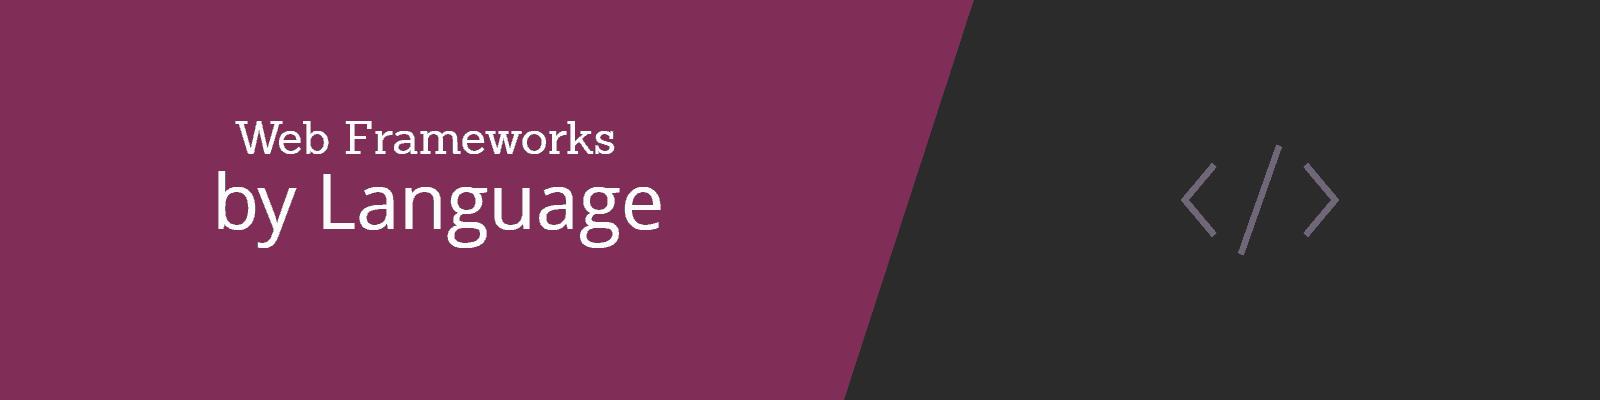 Framework by Language